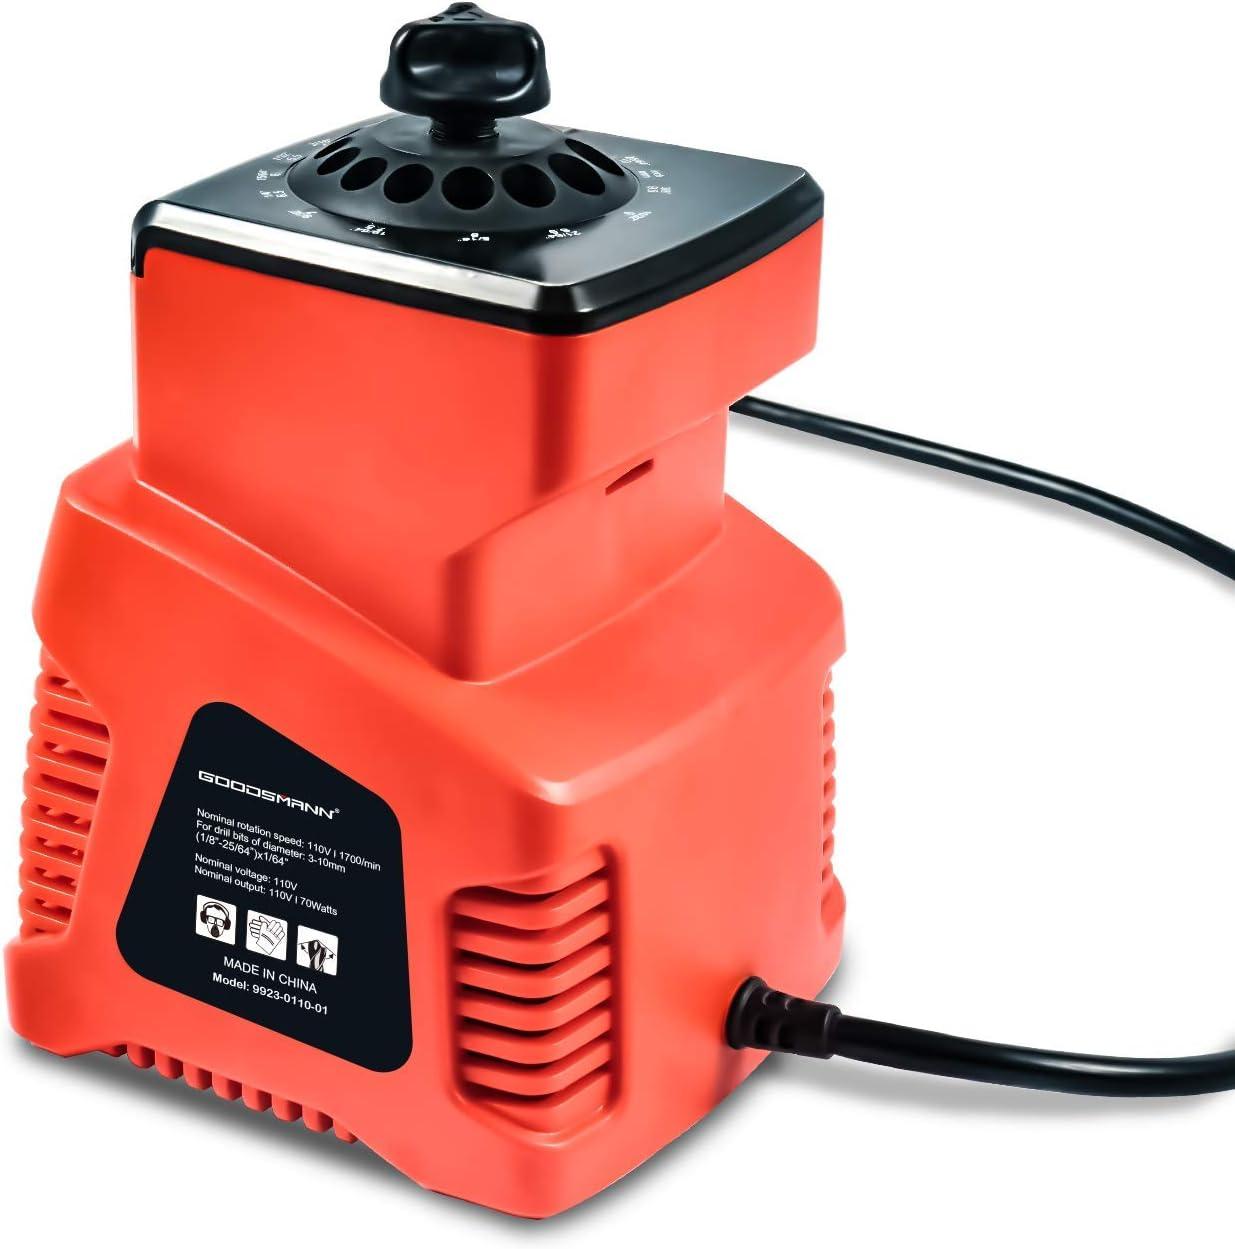 SILVERLINE 95 W Perceuse électrique HSS Bit Sharpener Affûtage Outil Bits 3-10 mm New